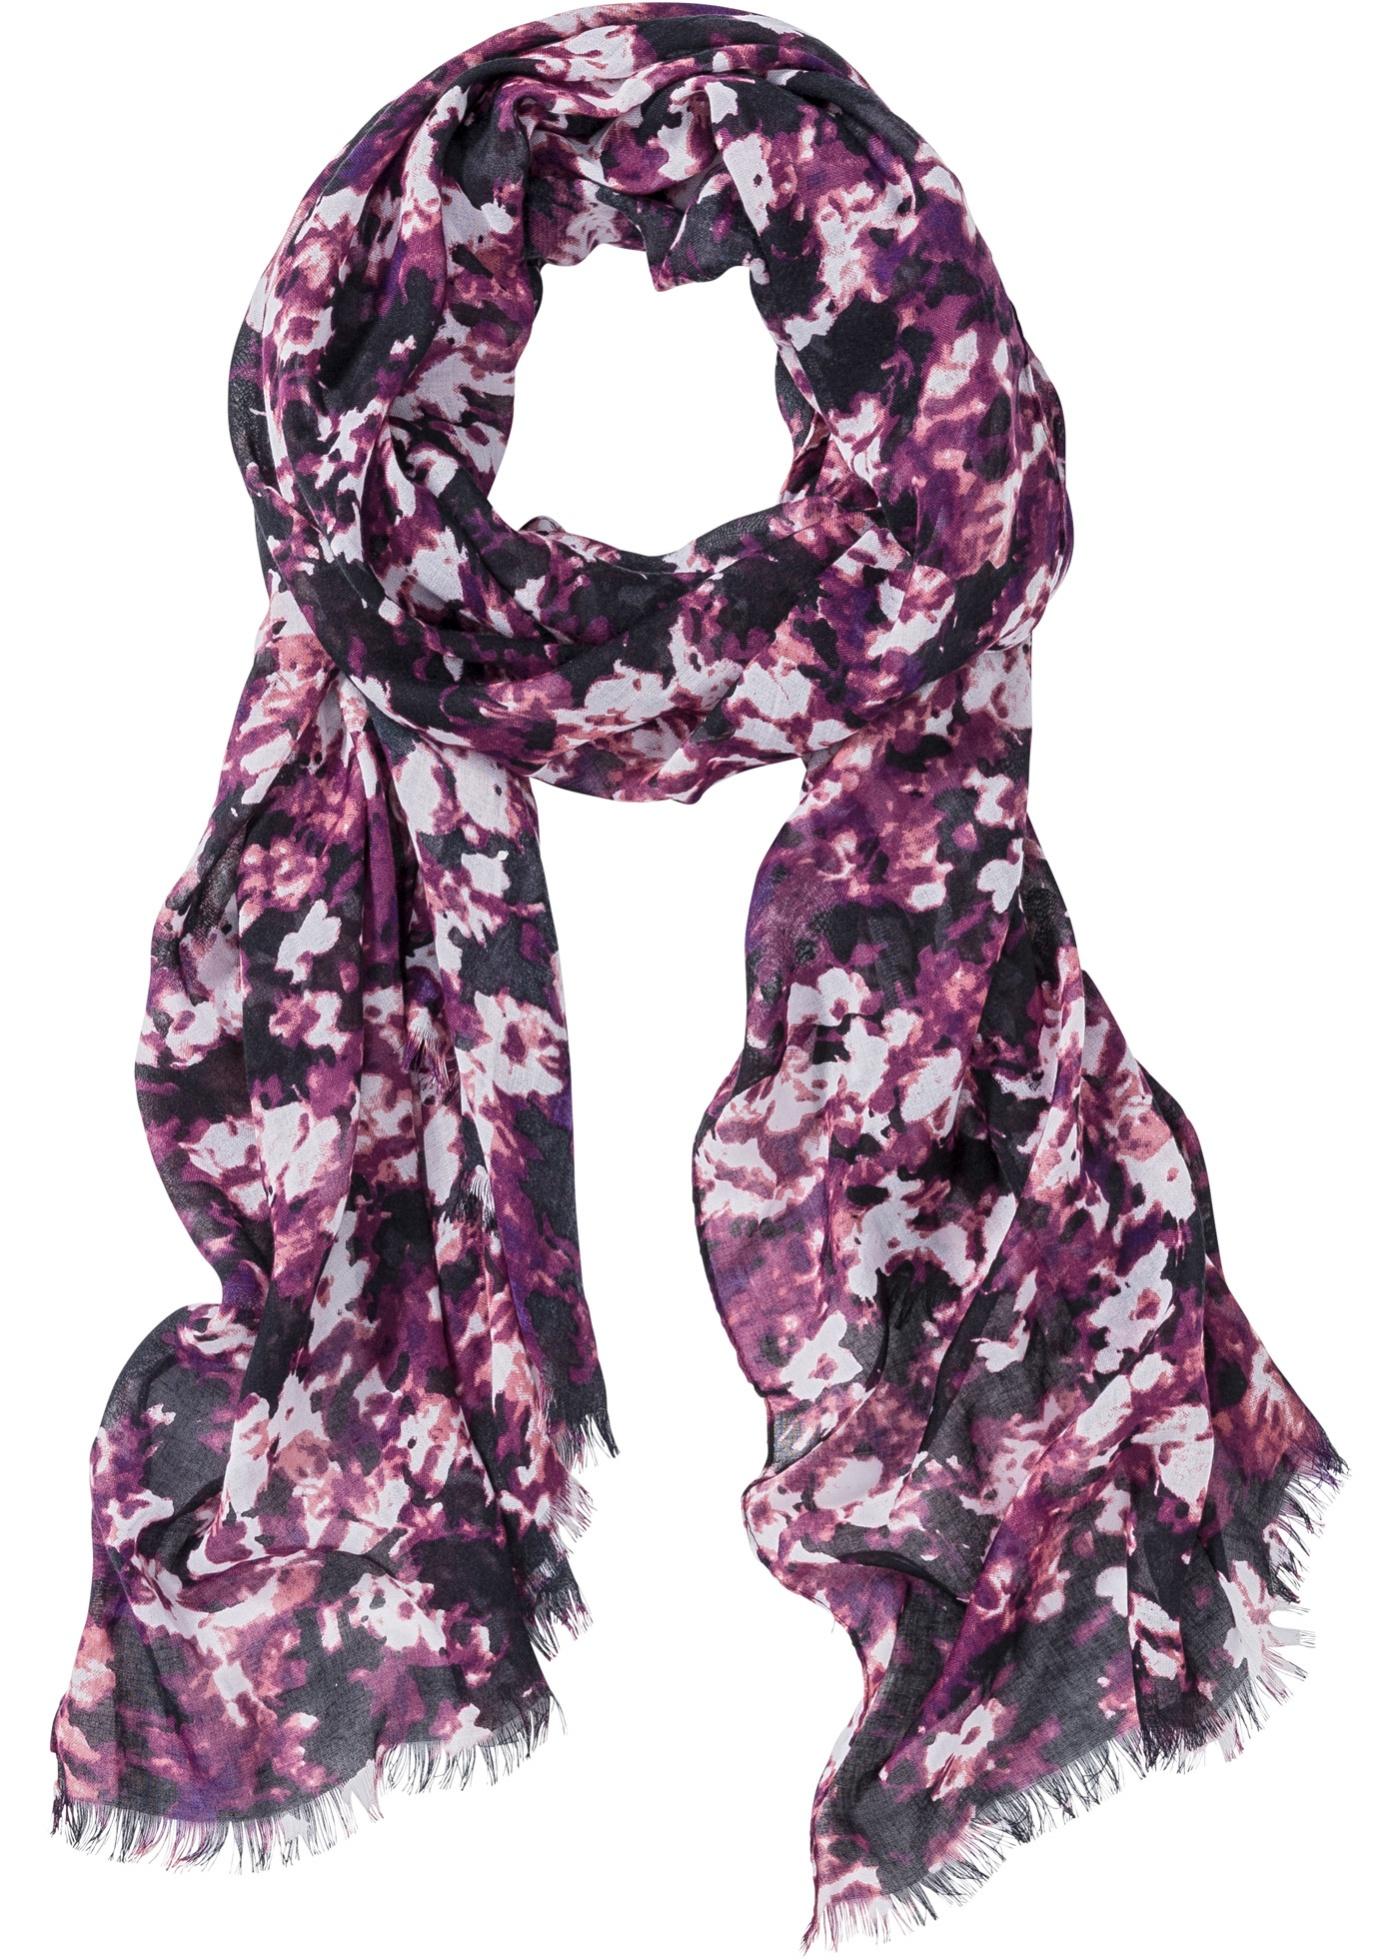 Blommig sjal, bpc bonprix collection, lila/pink